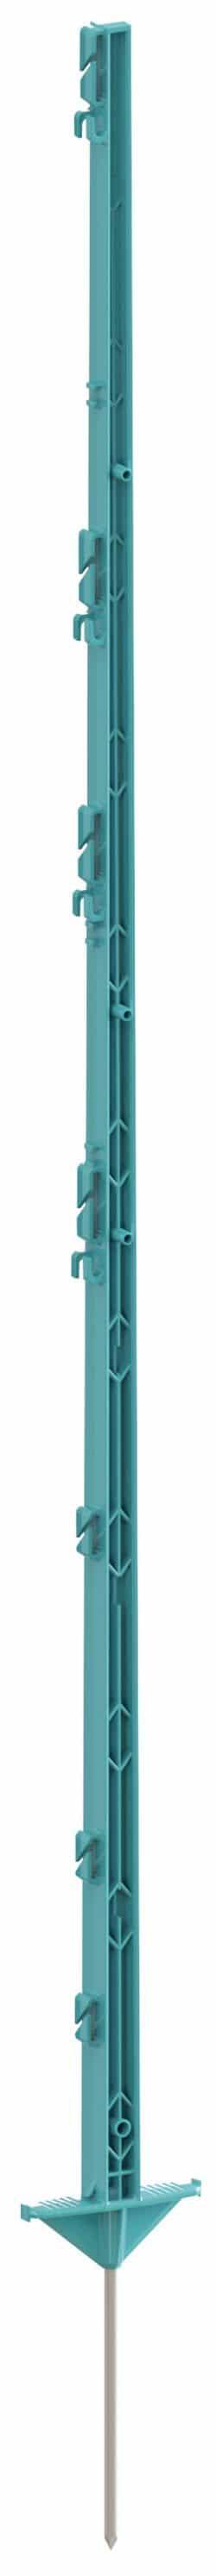 Plaststolpe Fashion 156cm Petrol - 89508824 - Stolpar